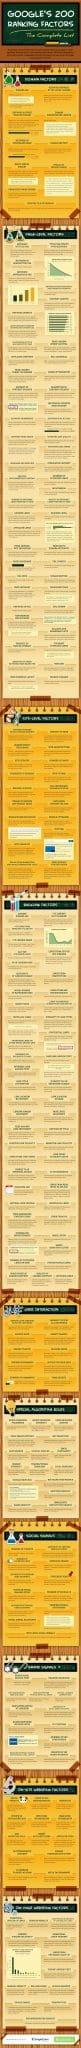 200 google ranking factors list